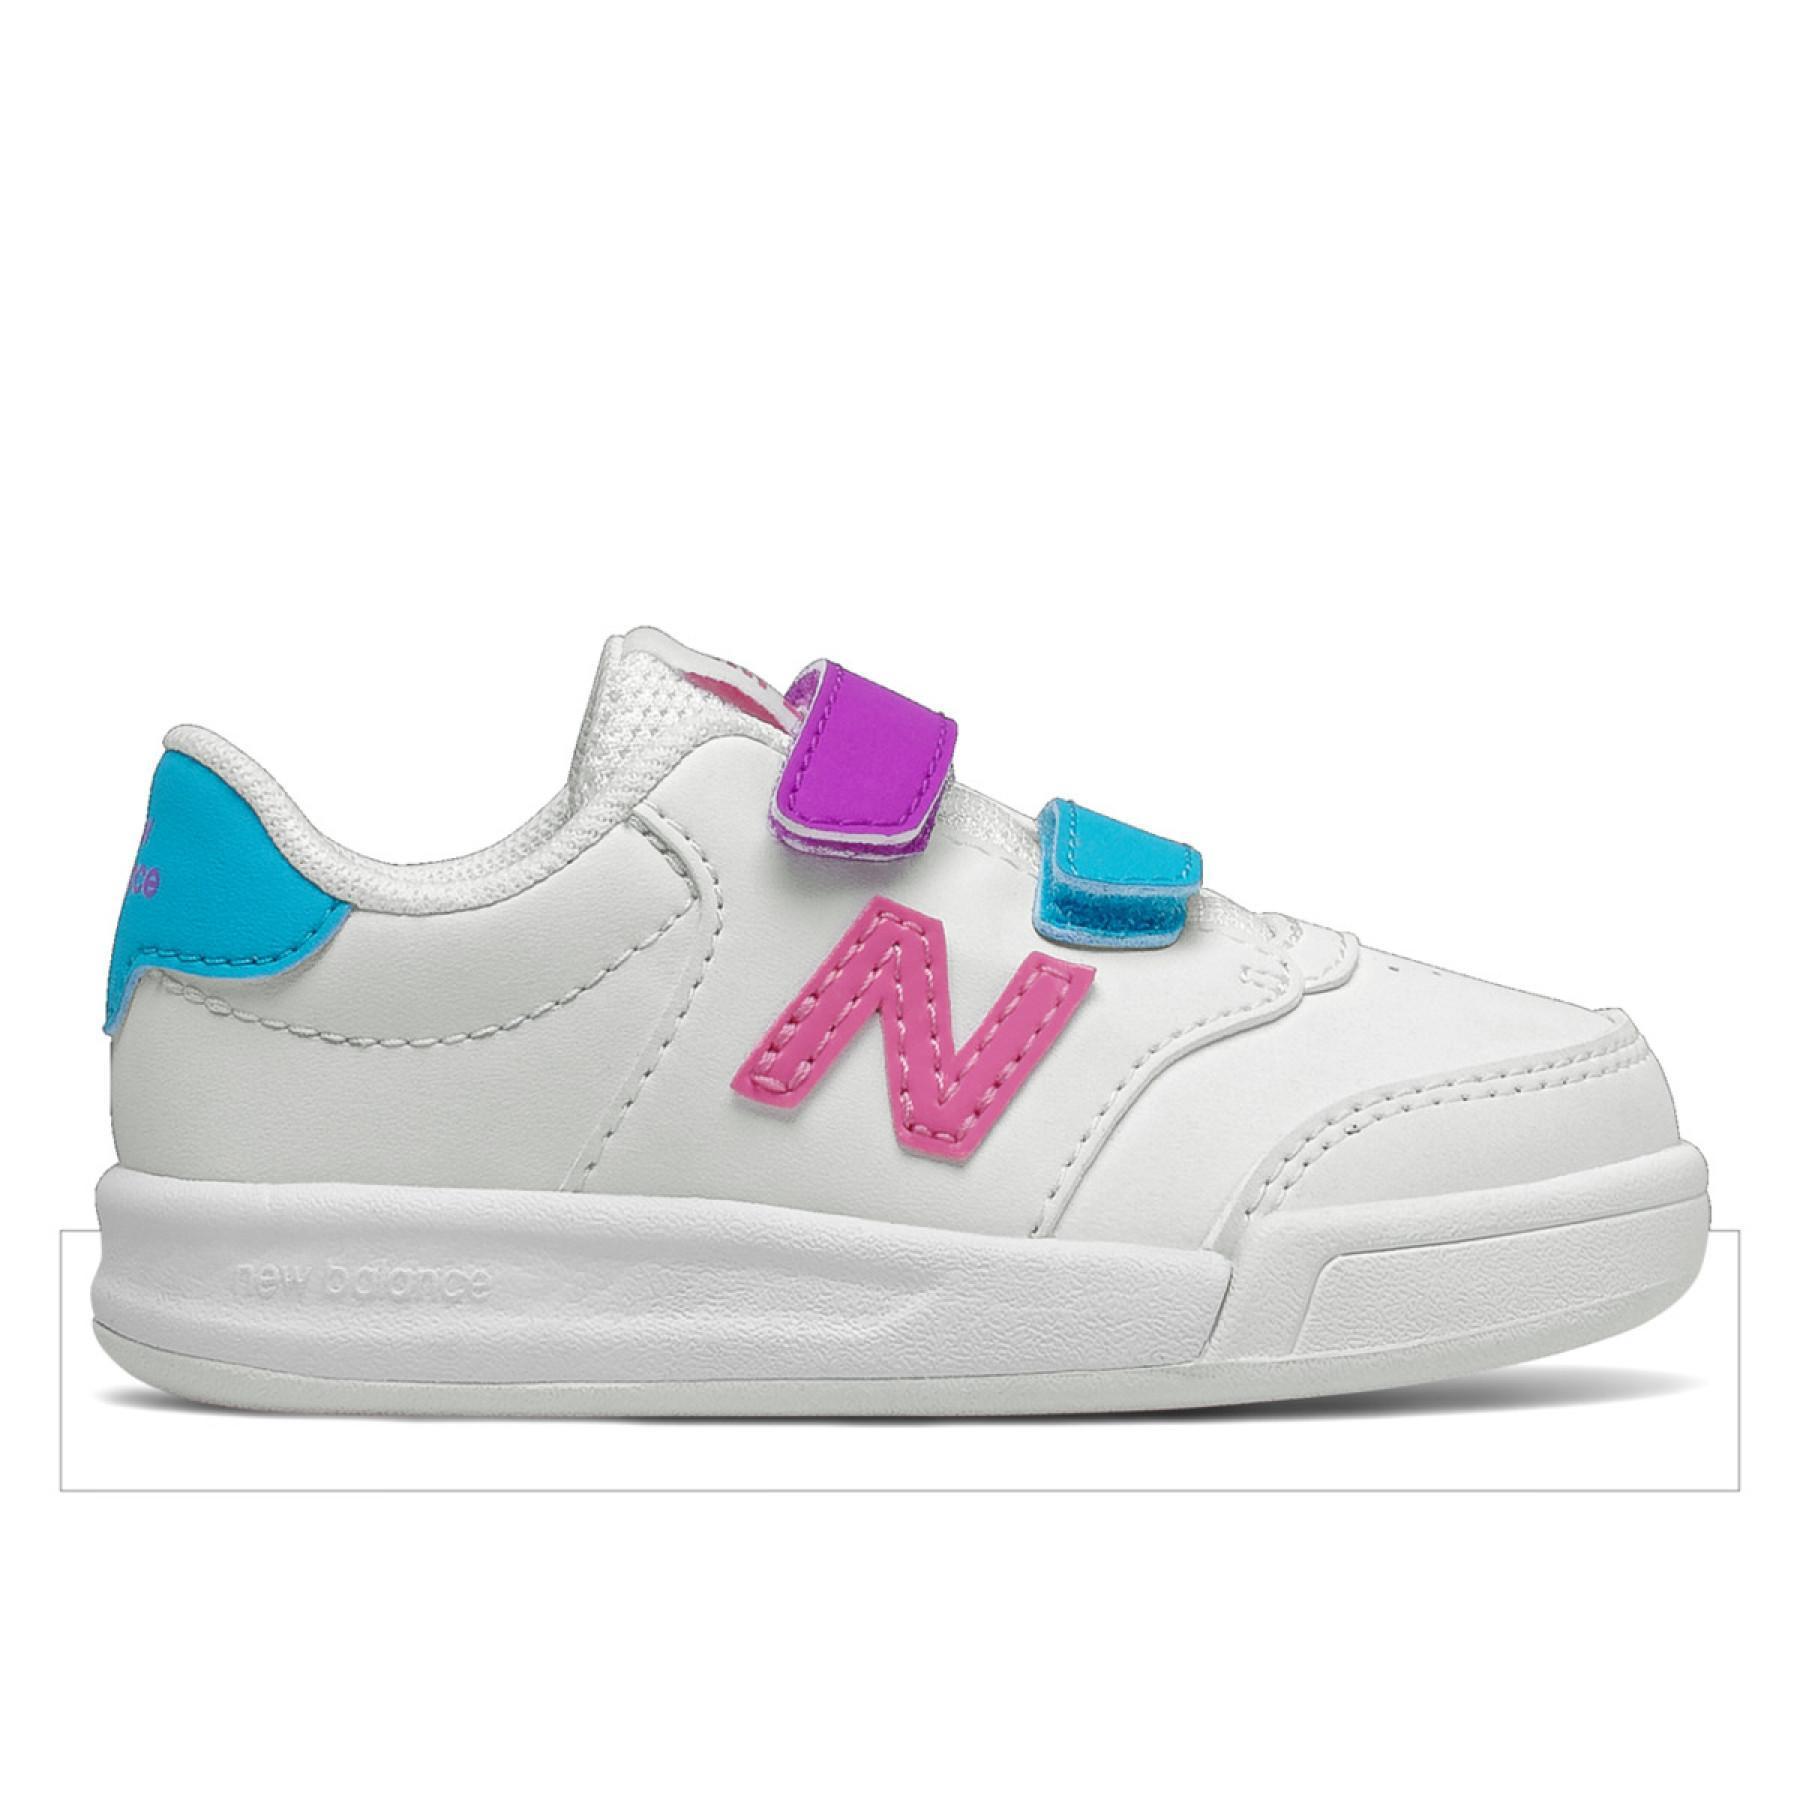 Scarpe per bambini New Balance ct60